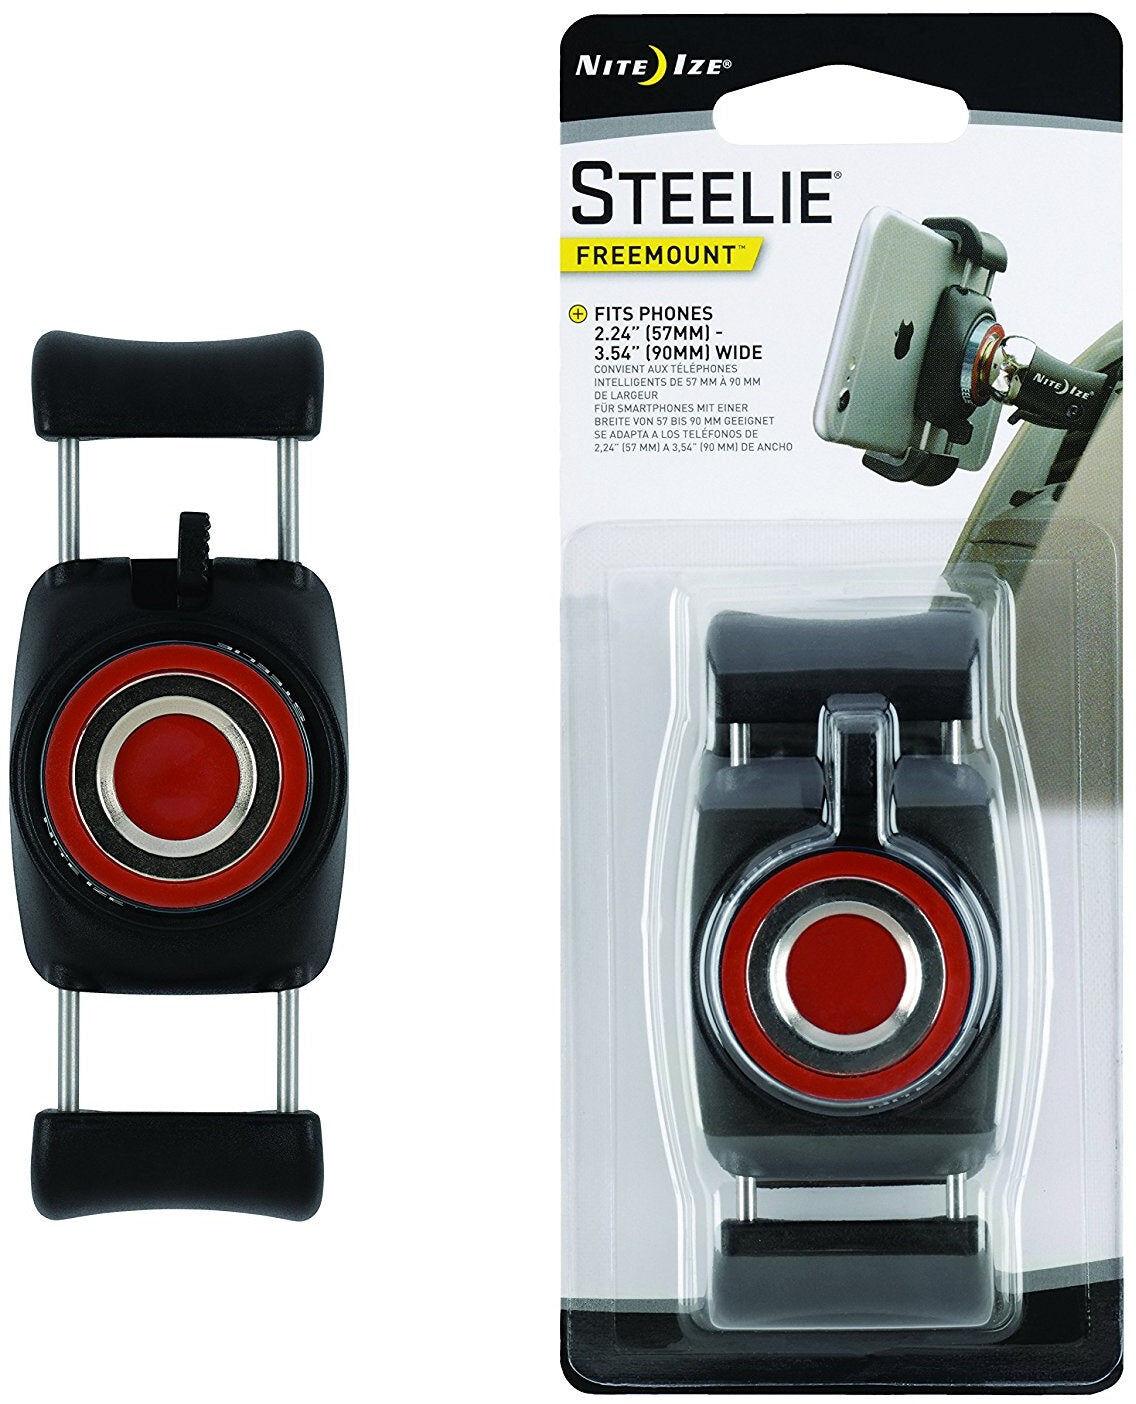 Nite Ize Stf-01-r7 Steelie Freemount Universal Cell Phone Holder